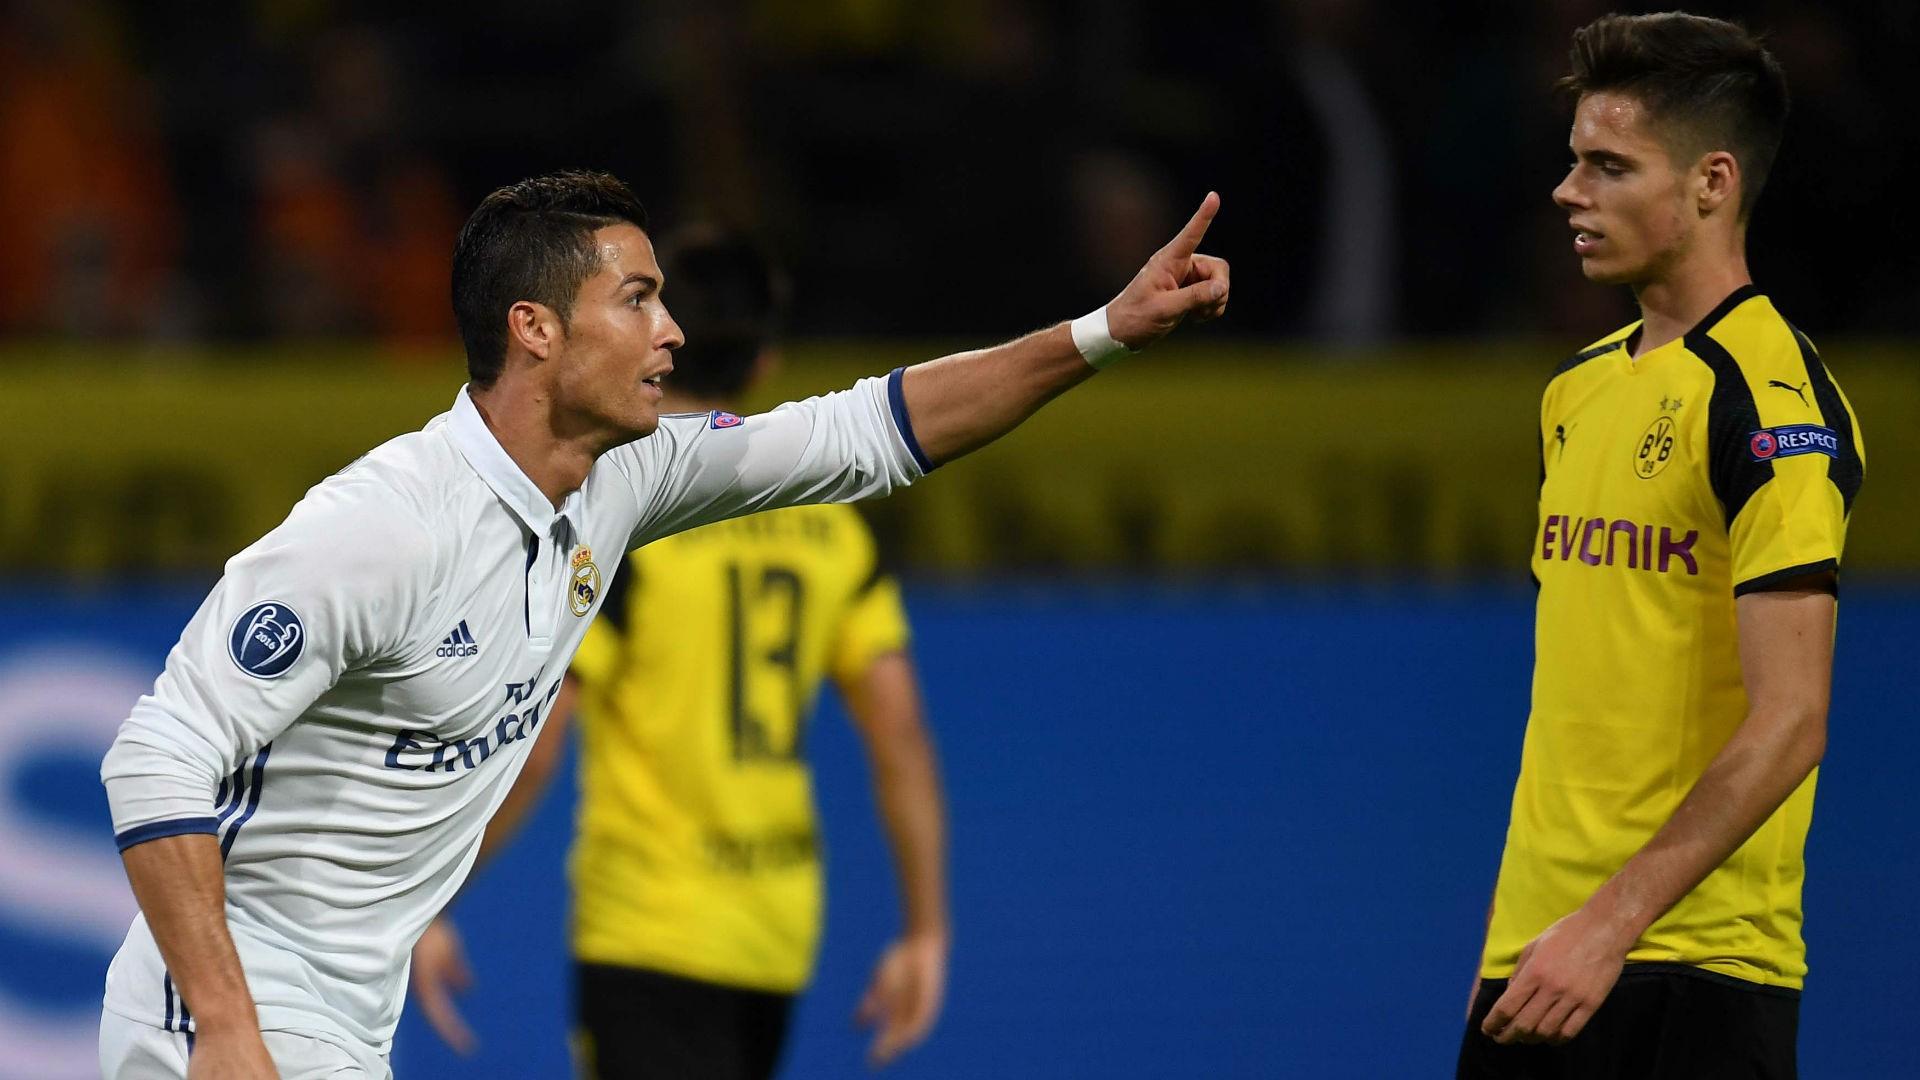 Borussia Dortmund Photo Gallery